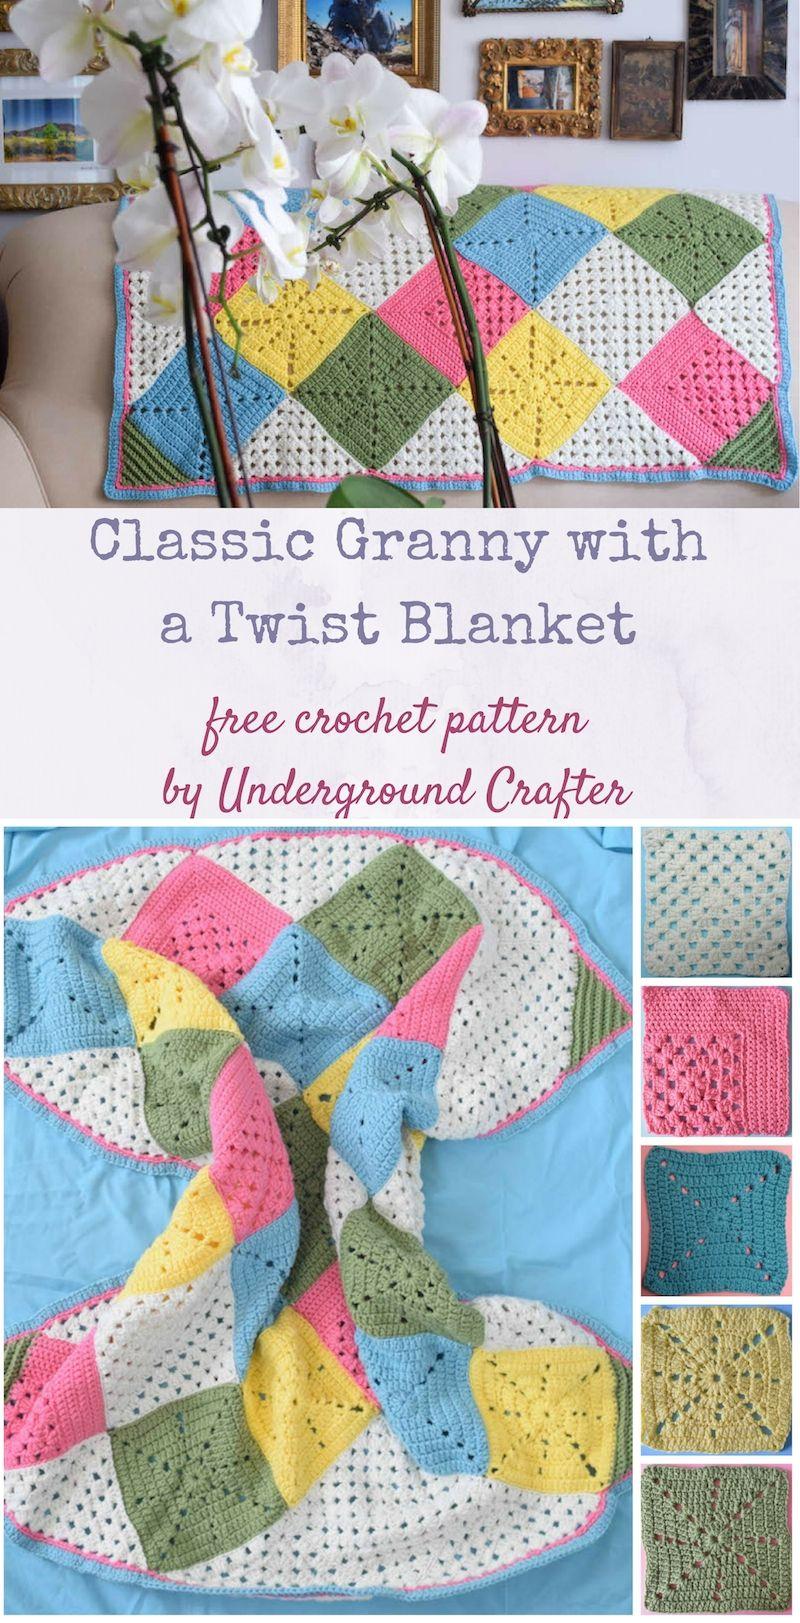 e1fbf0e4d9c3 Crochet pattern  Classic Granny with a Twist Blanket